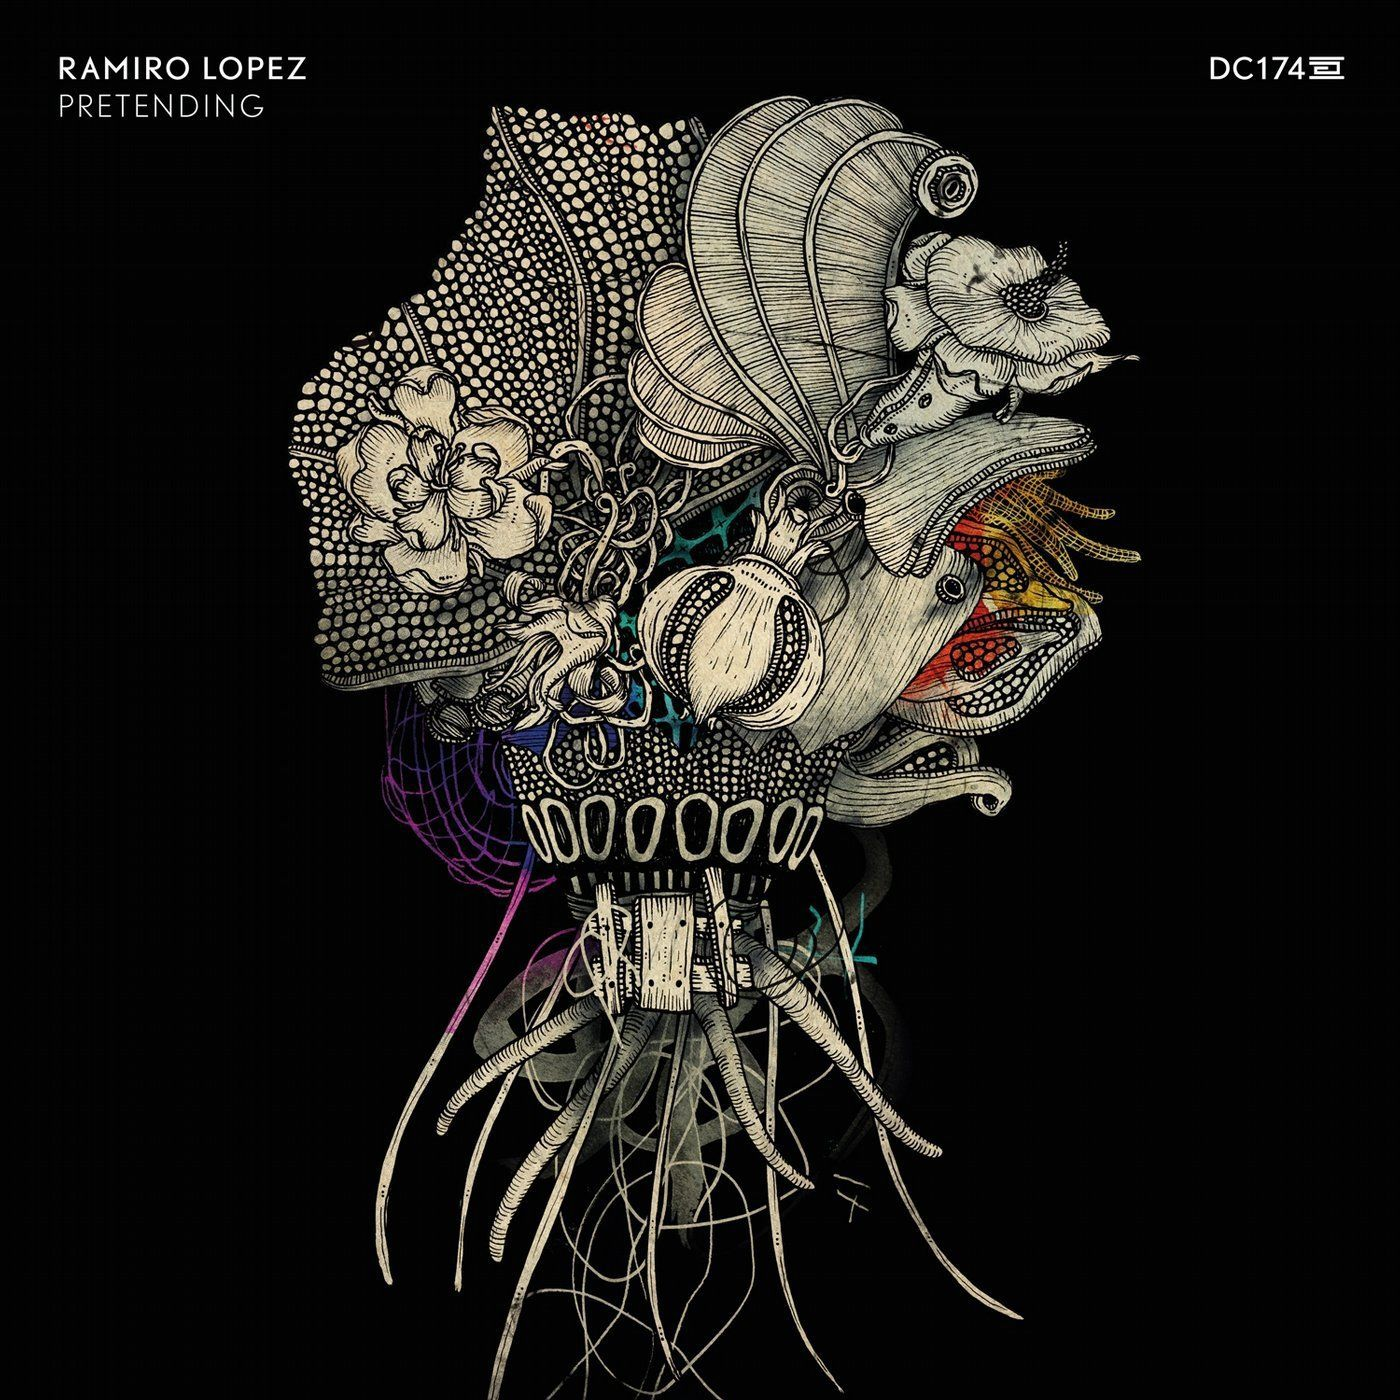 Ramiro Lopez Pretending EP MP3 Download Free 320 Kbps